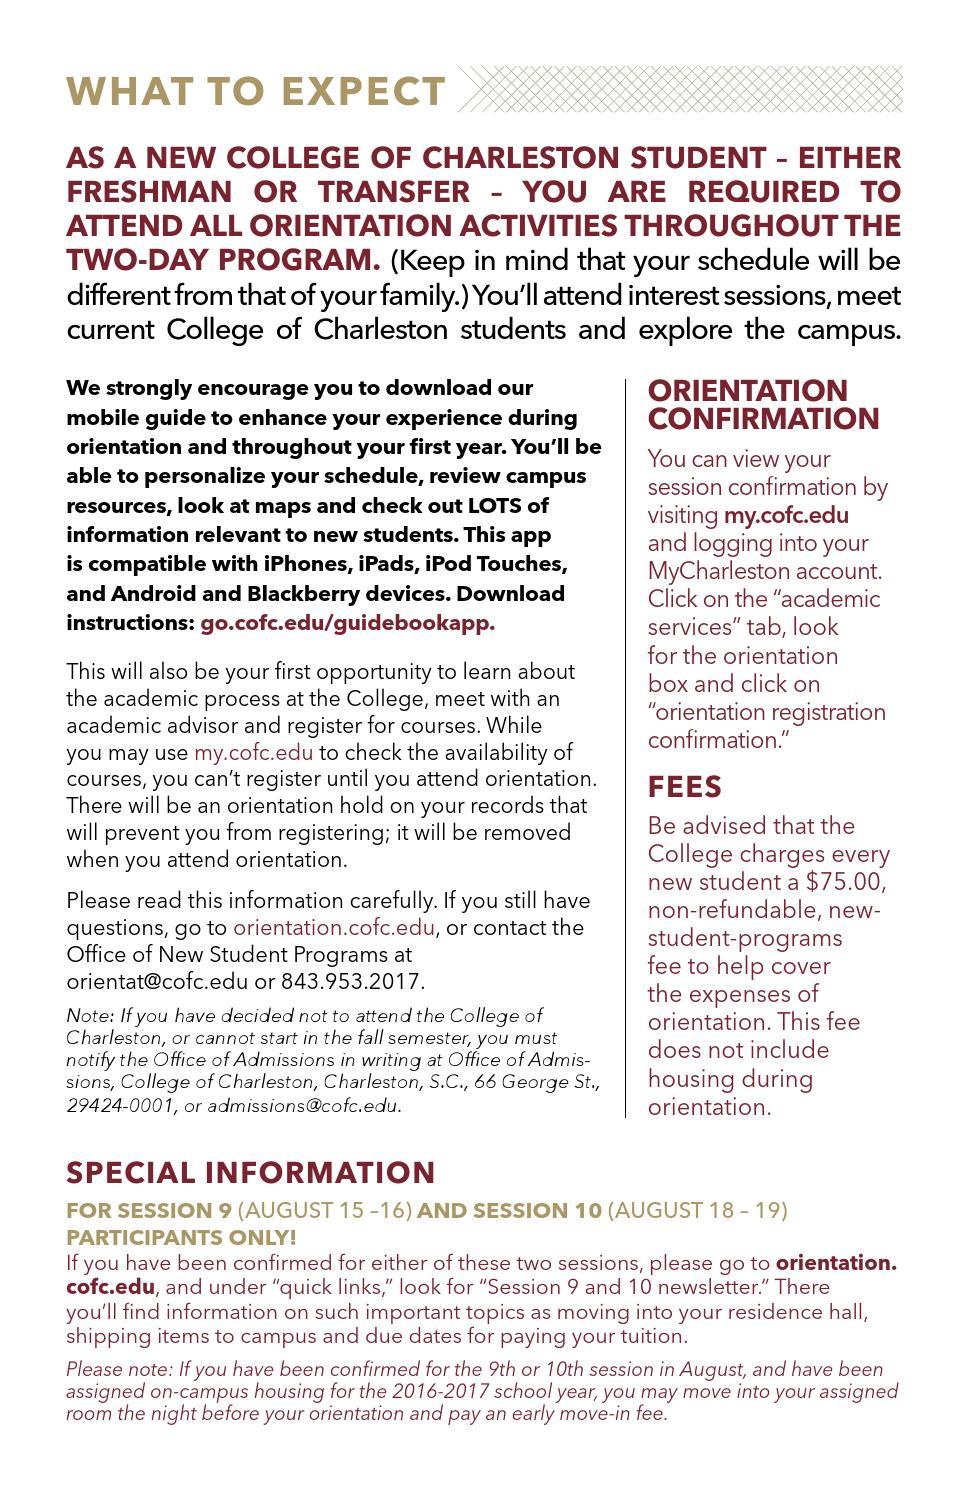 College of Charleston - Student Orientation Information